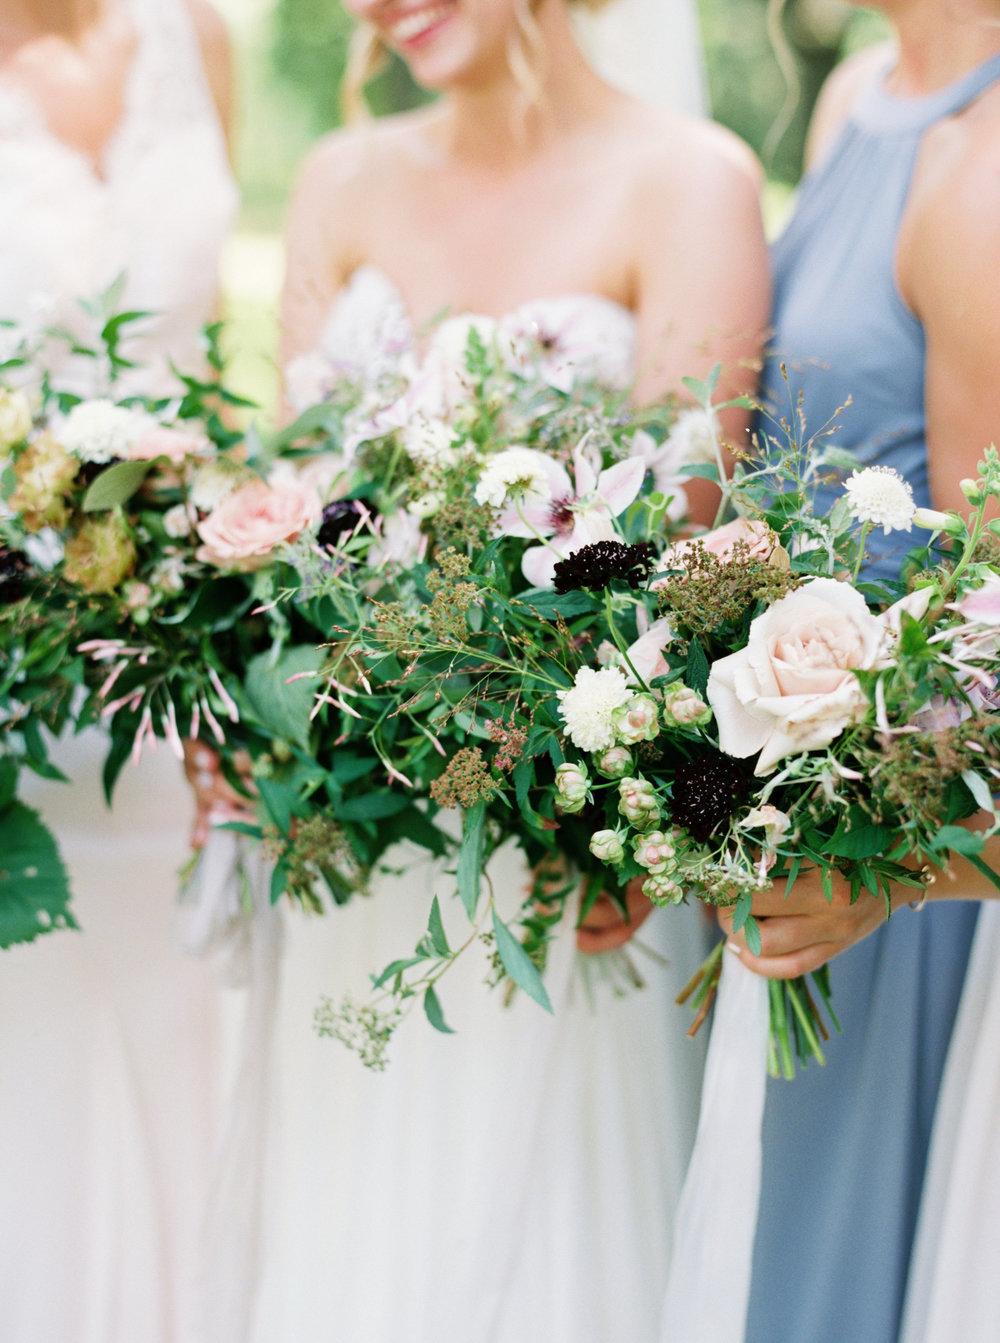 nicoleclarey_jenna+casey_weddingparty-64.jpg